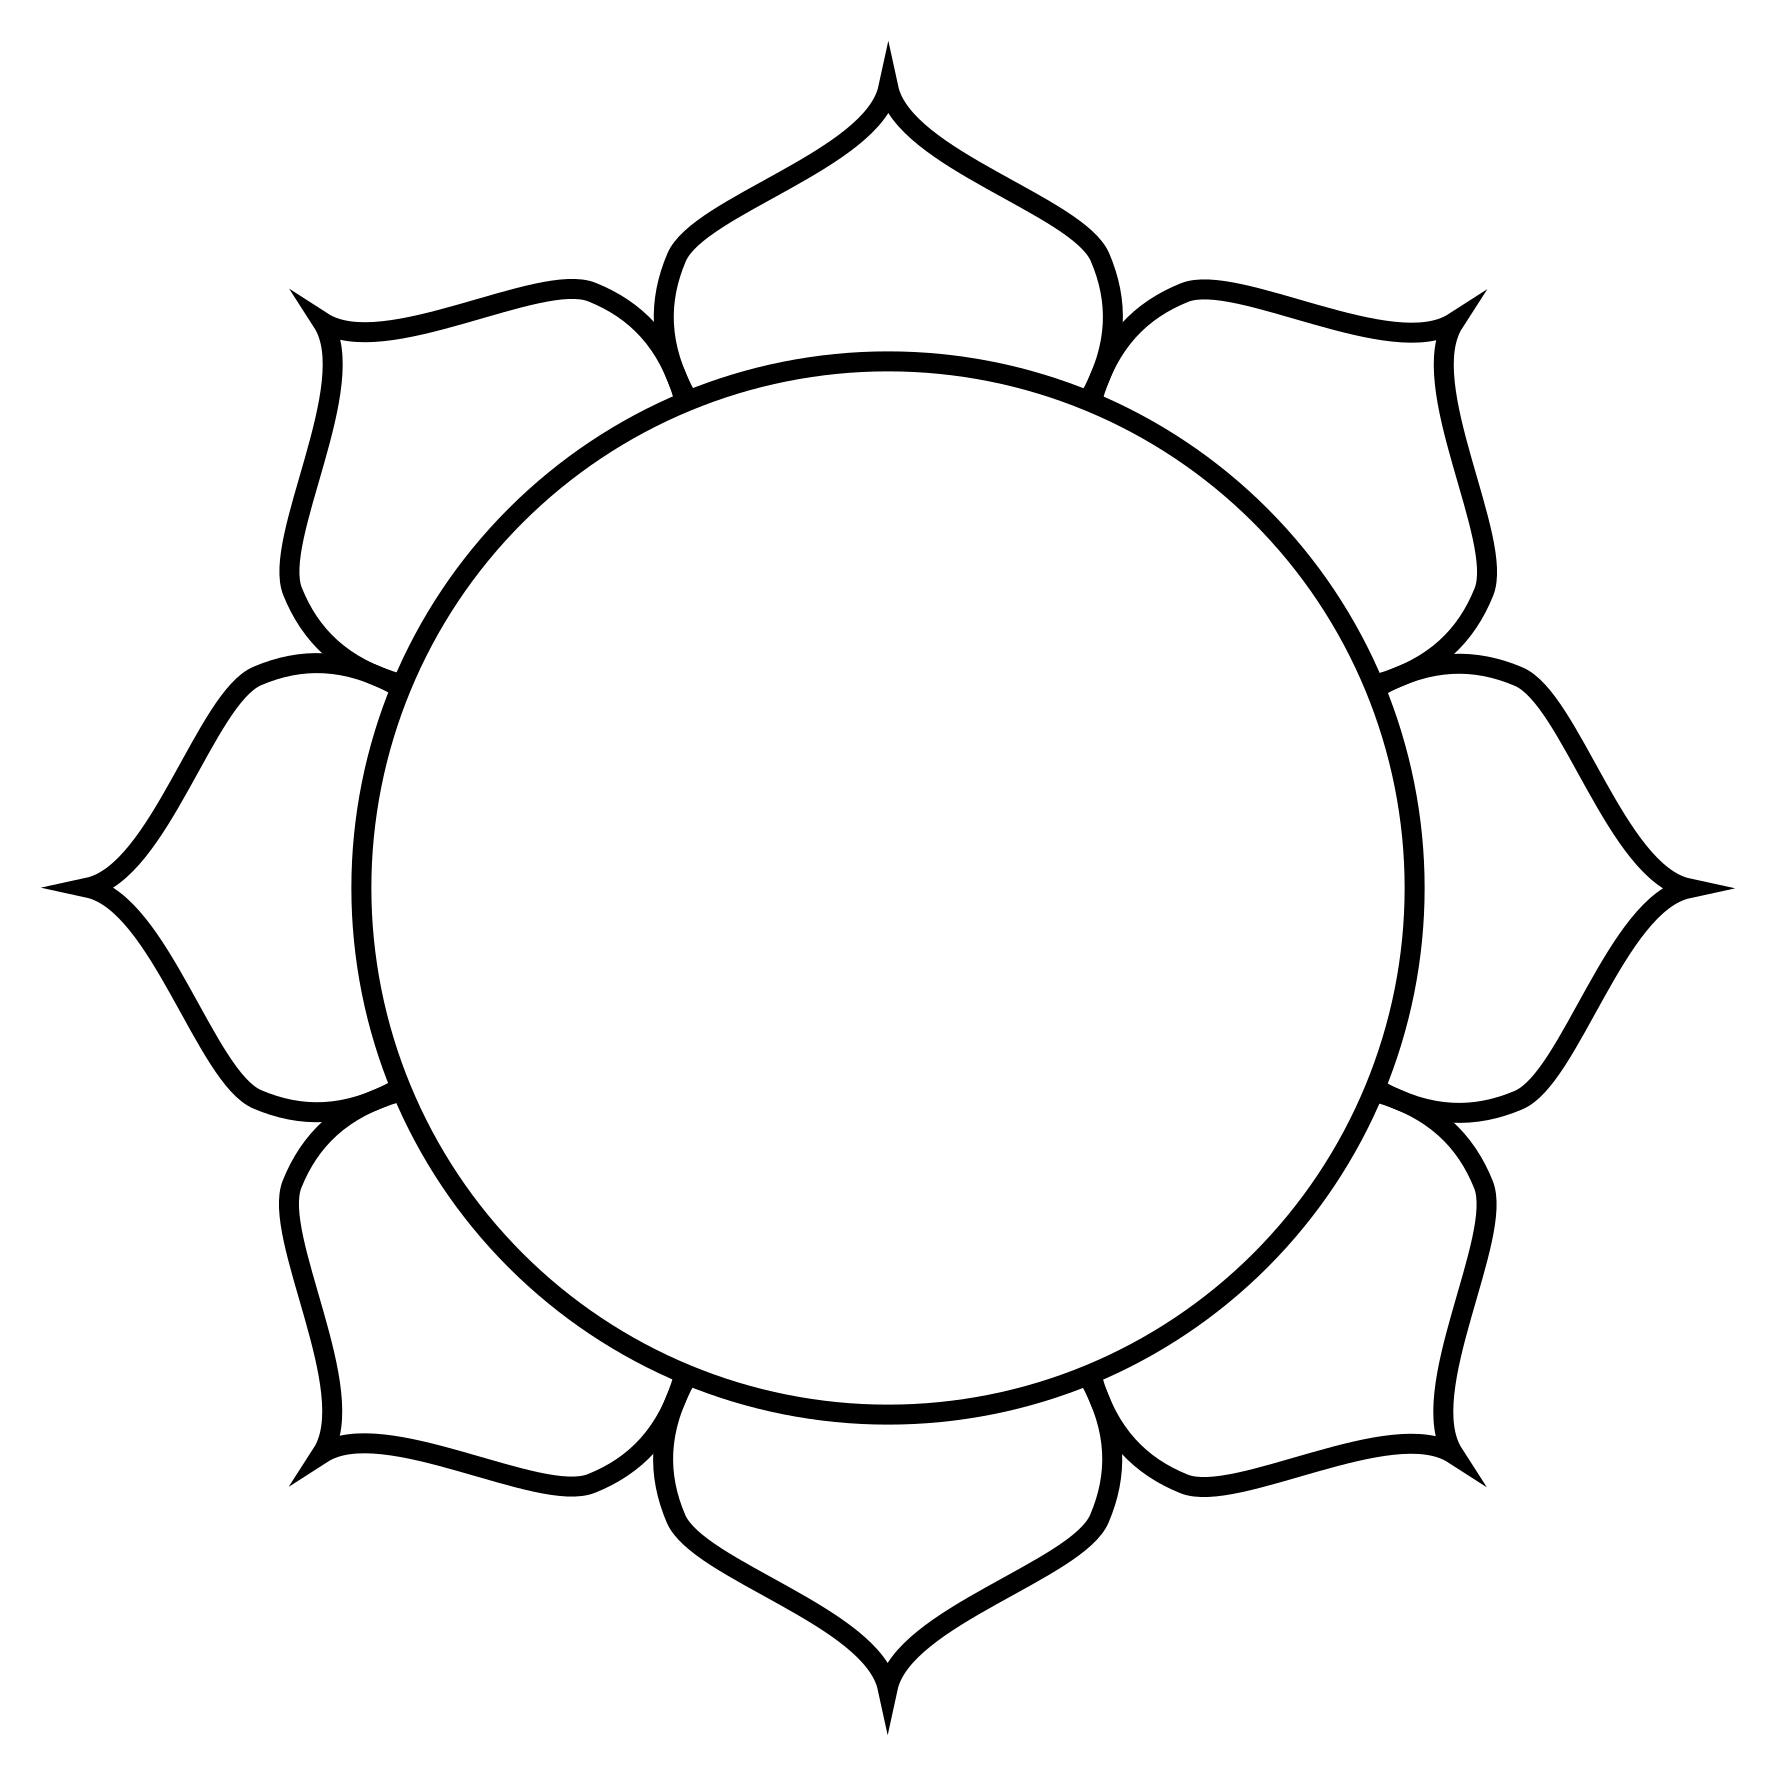 1776x1776 Lotus Flower Line Design